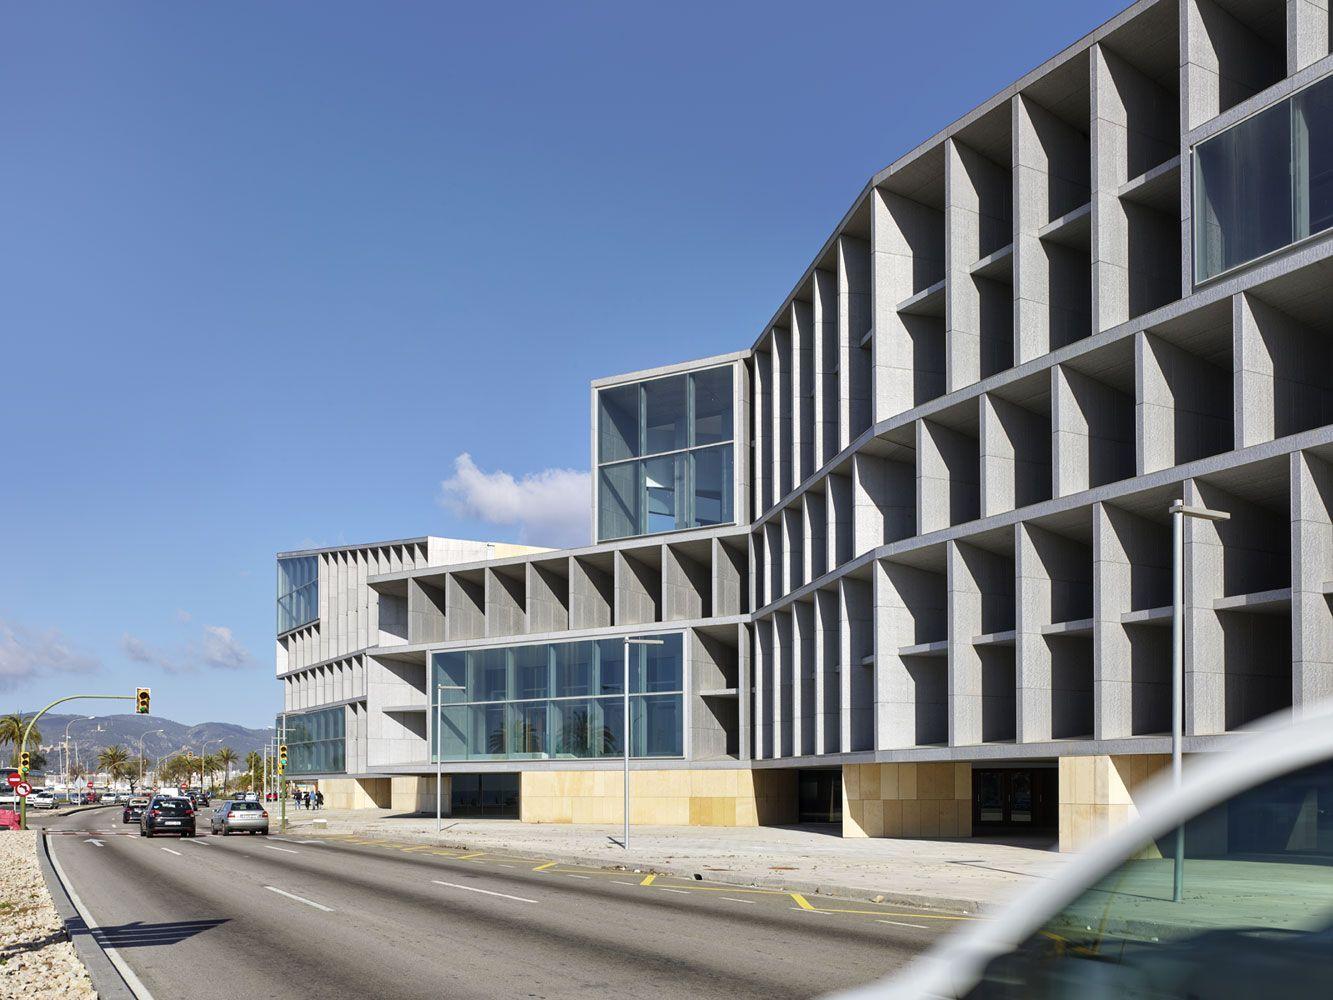 Francisco-Mangado-.-Palacio-de-Congresos-y-Hotel-.-Palma-de-Mallorca-5.jpg (1333×1000)